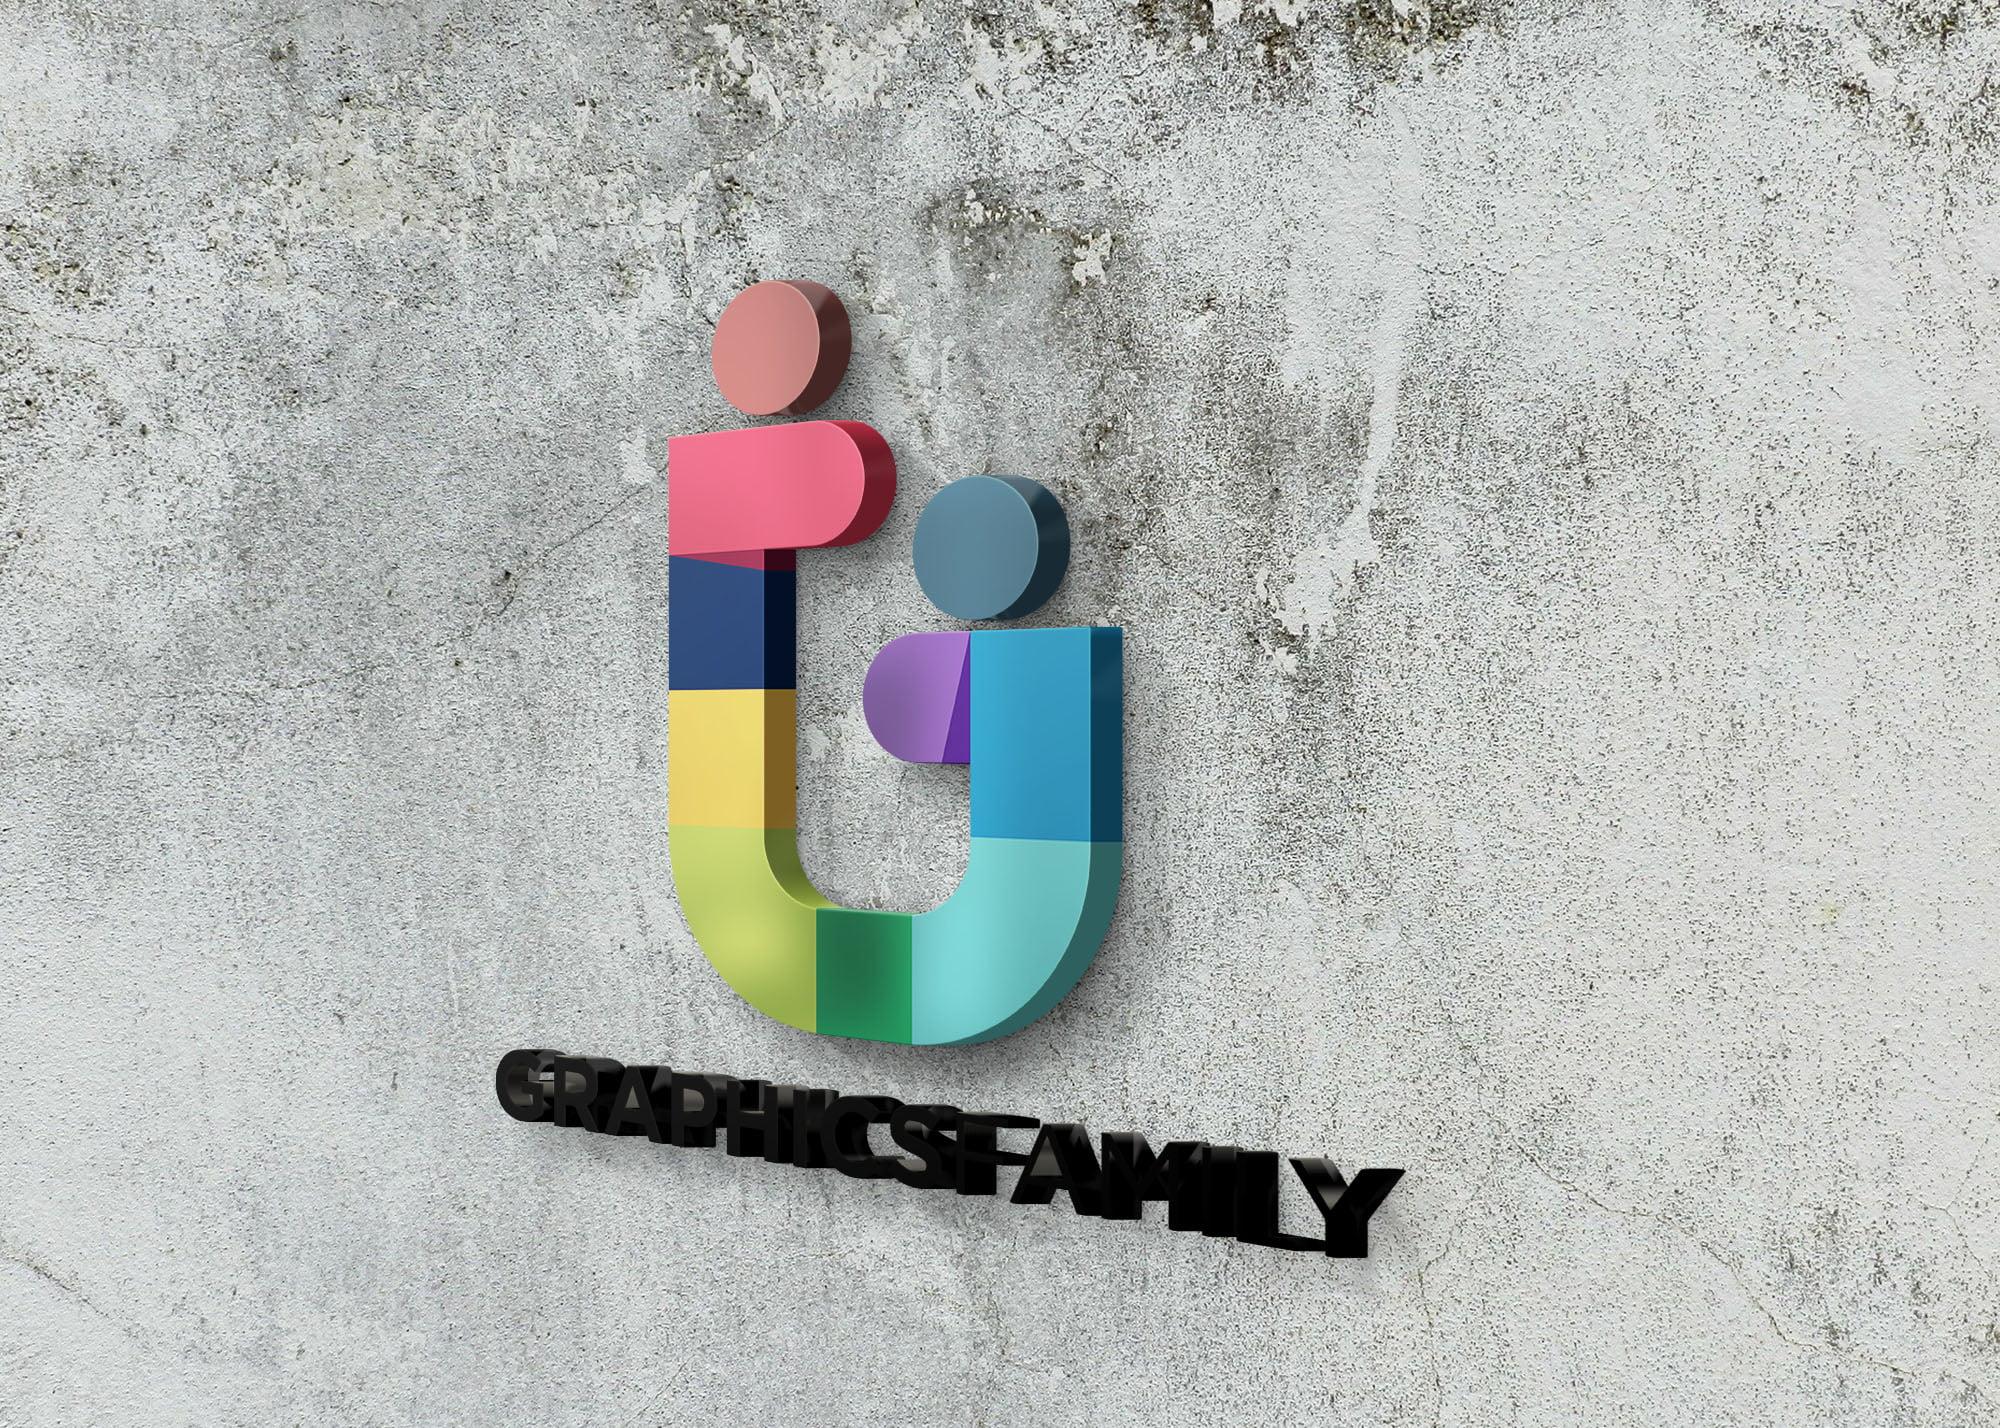 GraphicsFamily logo on 3d wall logo